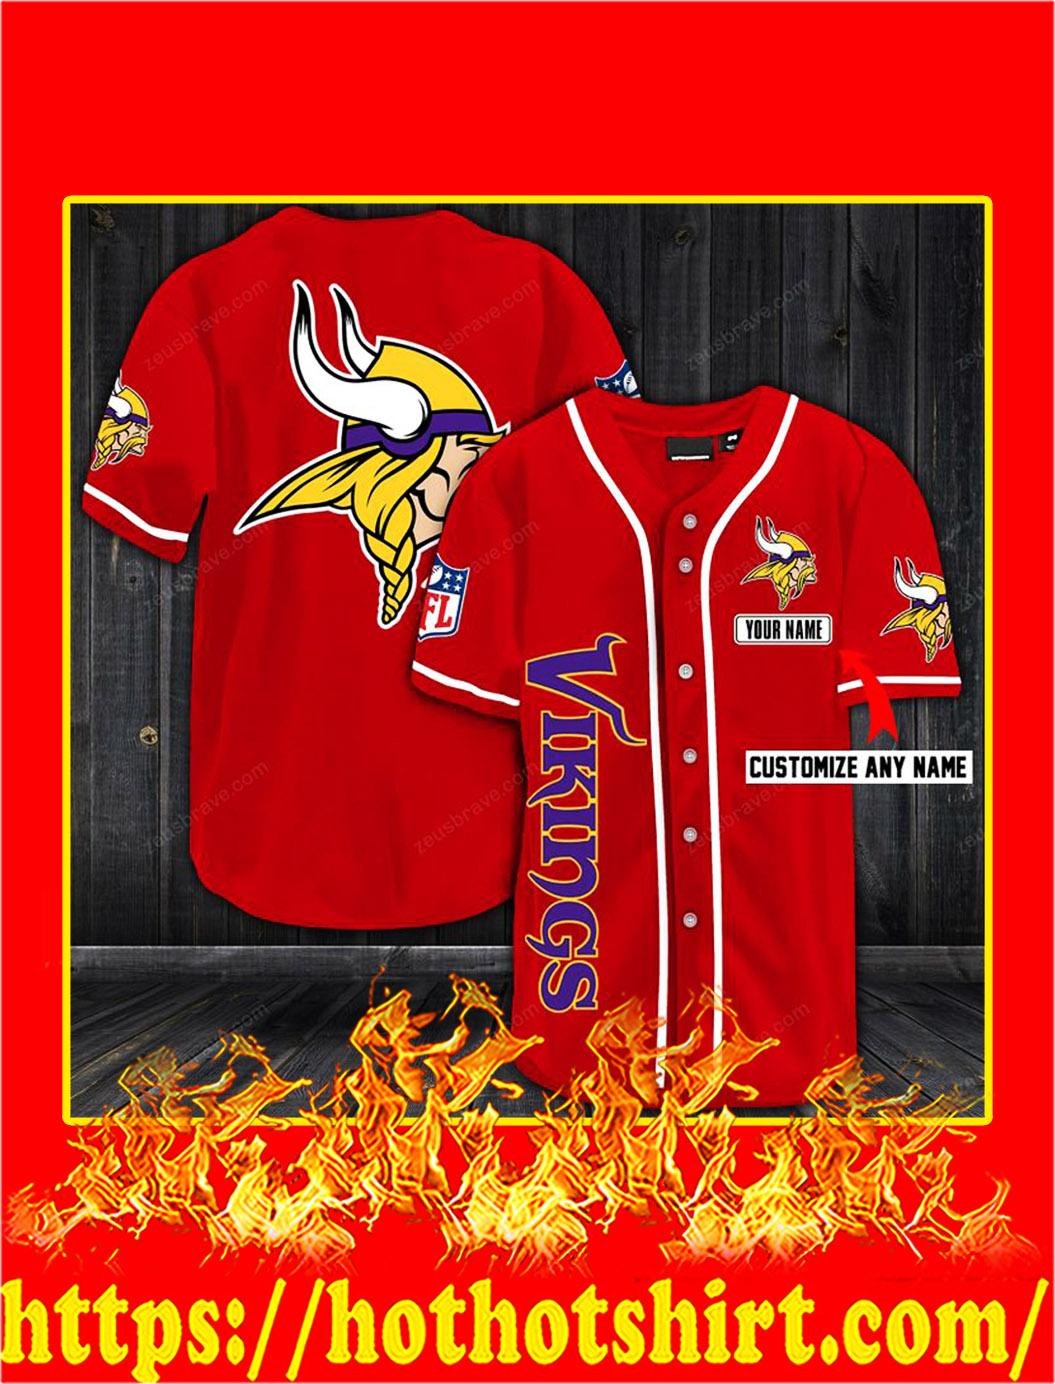 Customize name minnesota vikings hawaiian shirt- red